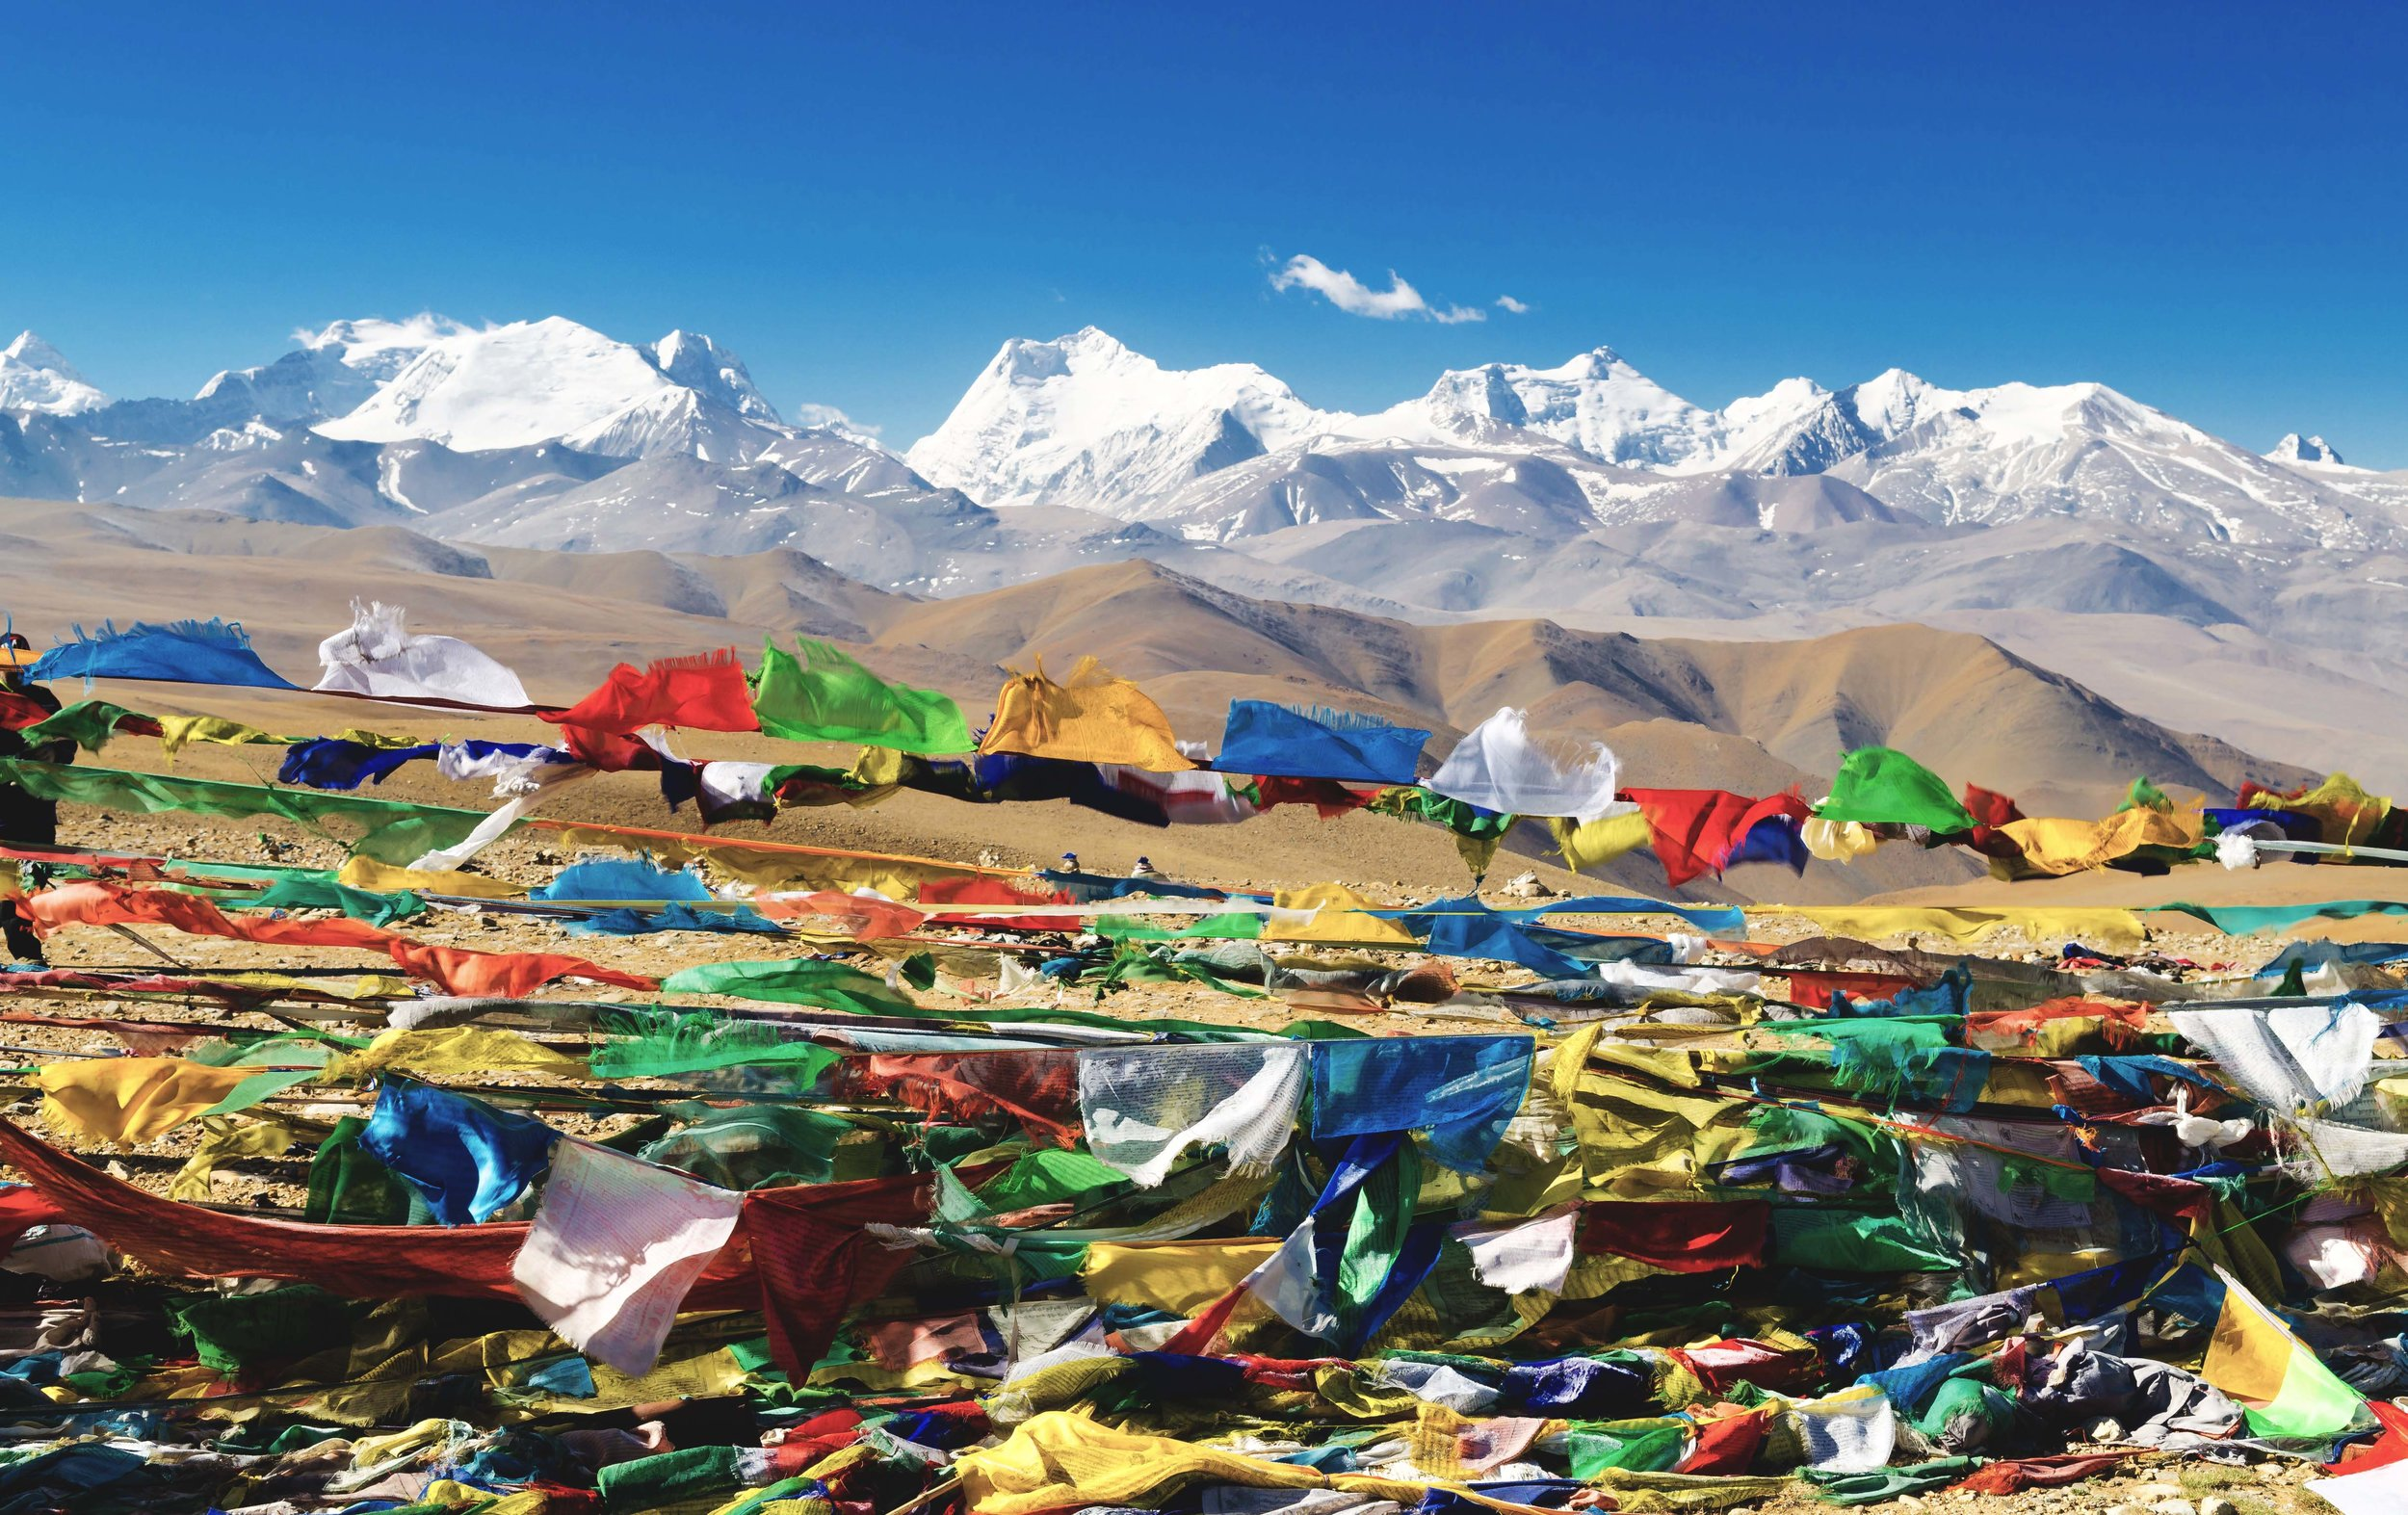 Thong La Pass Tibet